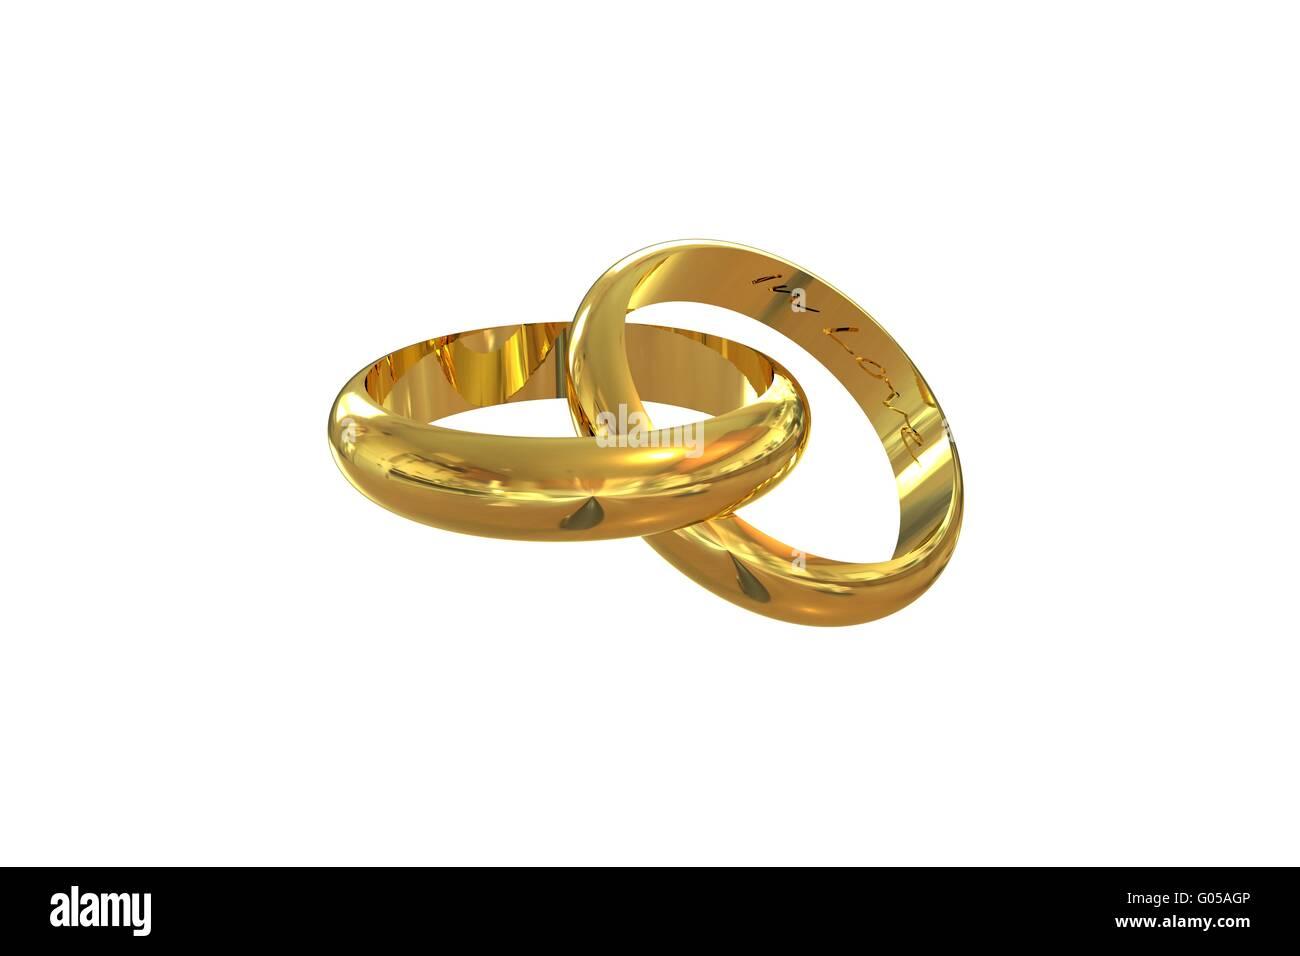 Wedding Rings In Love - Stock Image